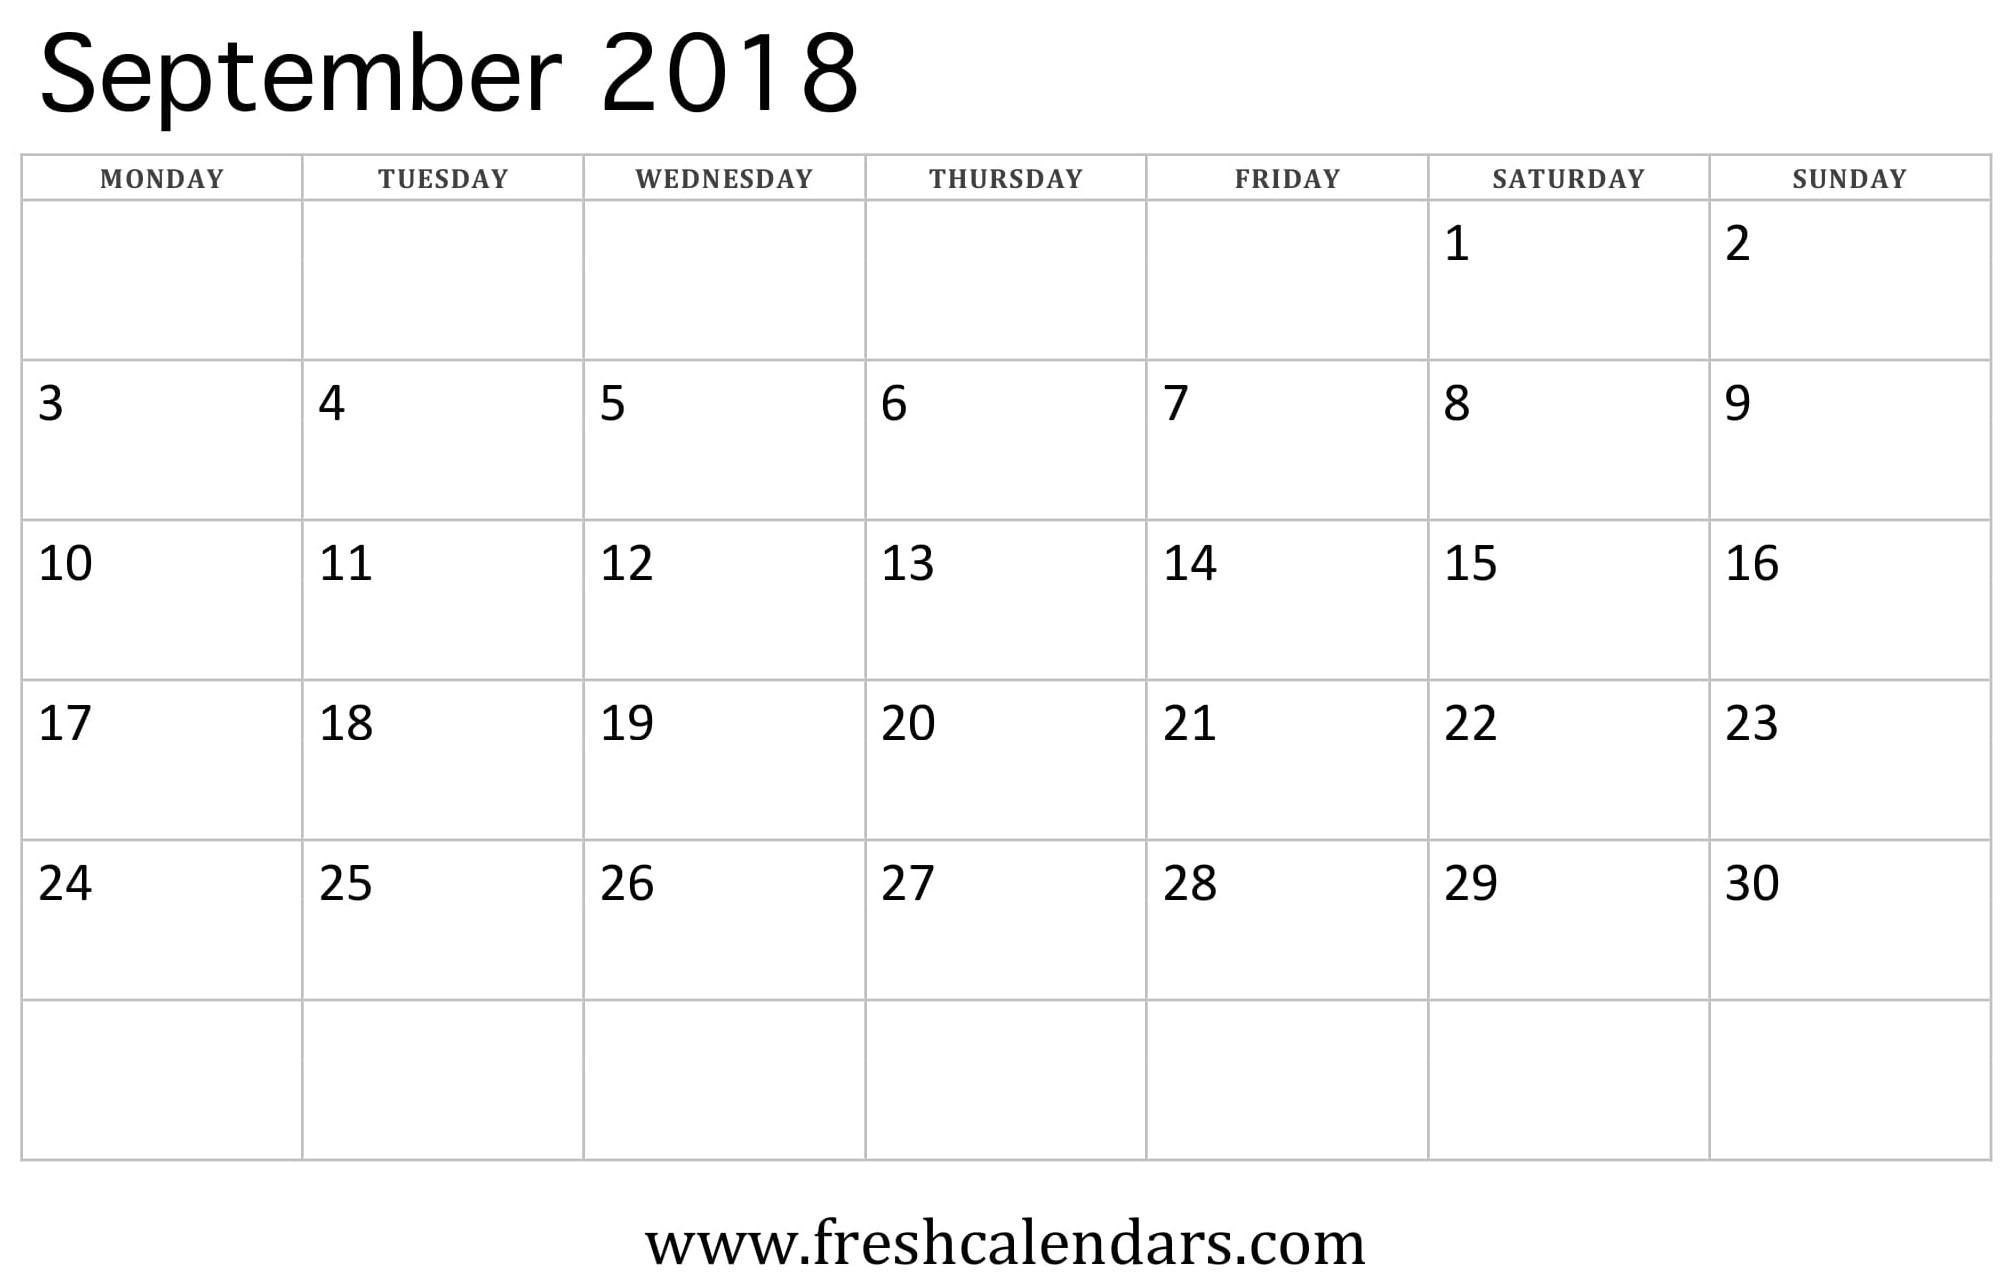 September 2018 Calendar Printable - Fresh Calendars-Printable Monthly Calendar Starting On Monday